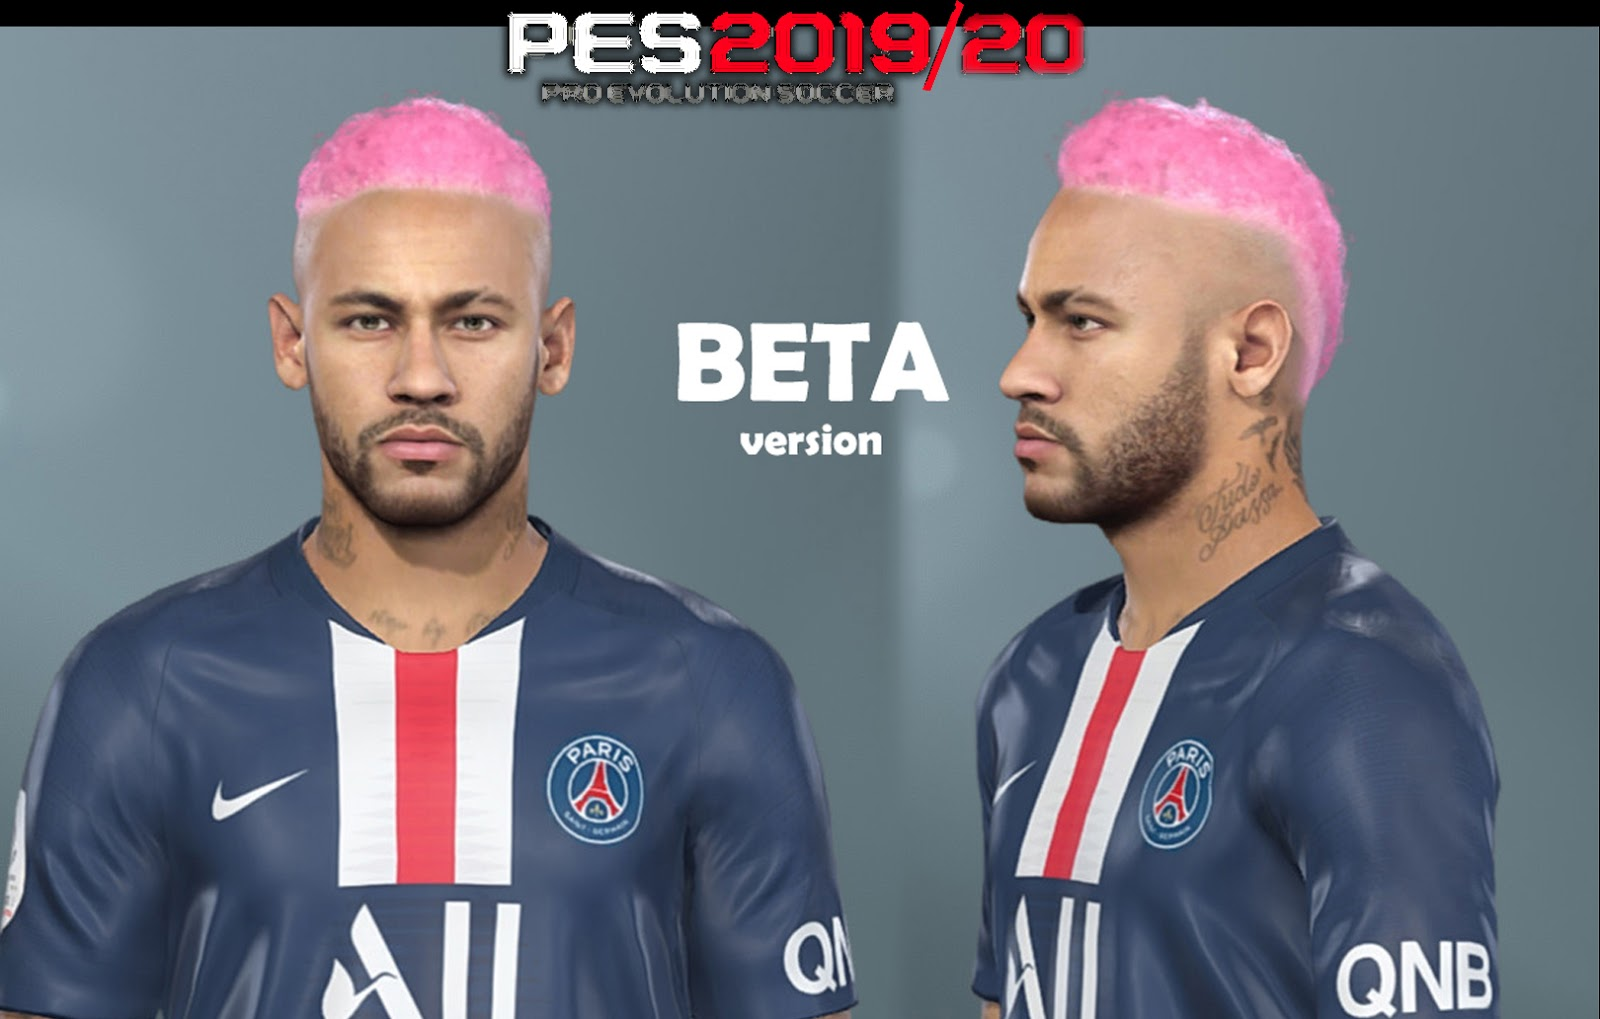 PES 2019 Faces Neymar Jr By Nanilincol44